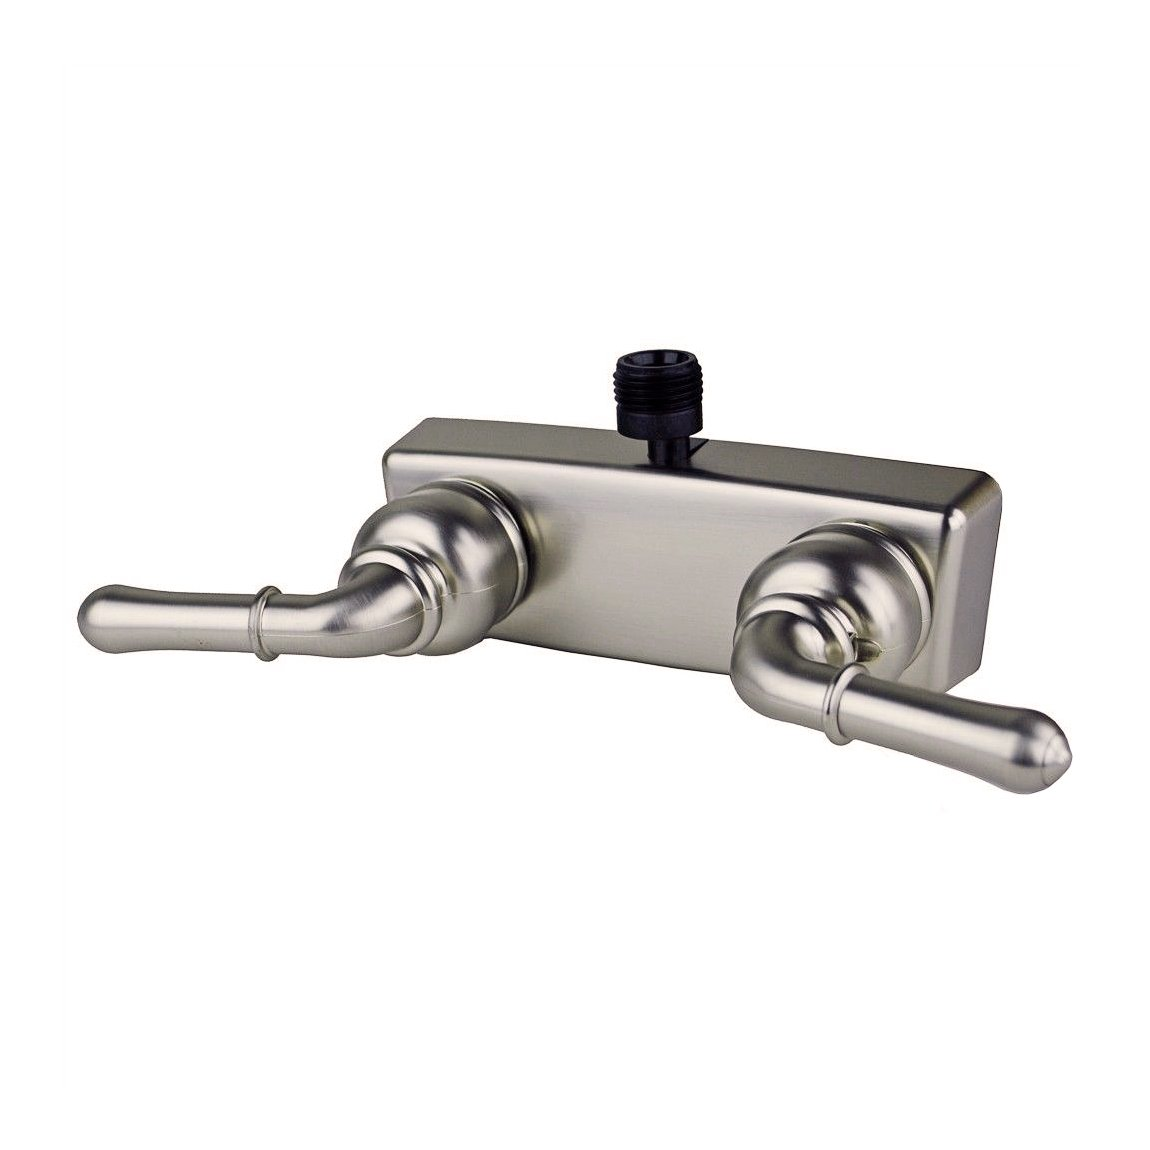 RV / Mobile Motor Home Shower 4' Shower Faucet, Brushed Nickel HowPlumb